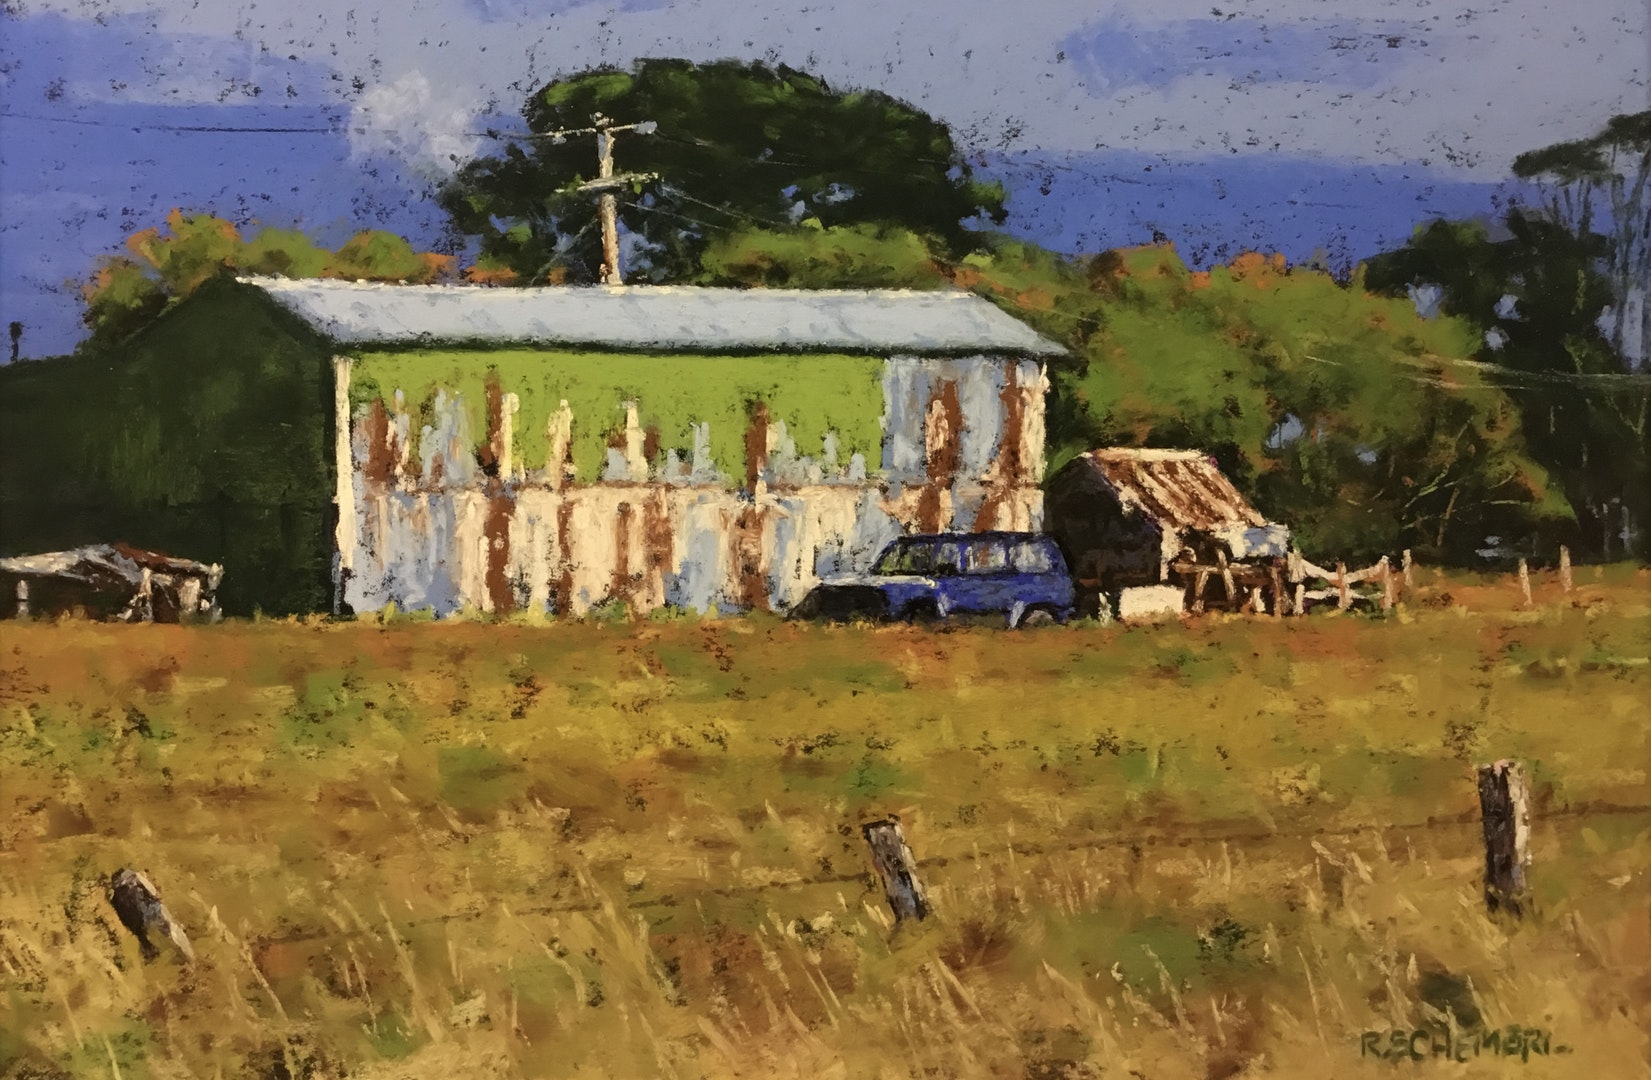 'Daniel's Yard', Ricky Schembri, Pastel on Mi Teintes paper, 50 x 60 cm